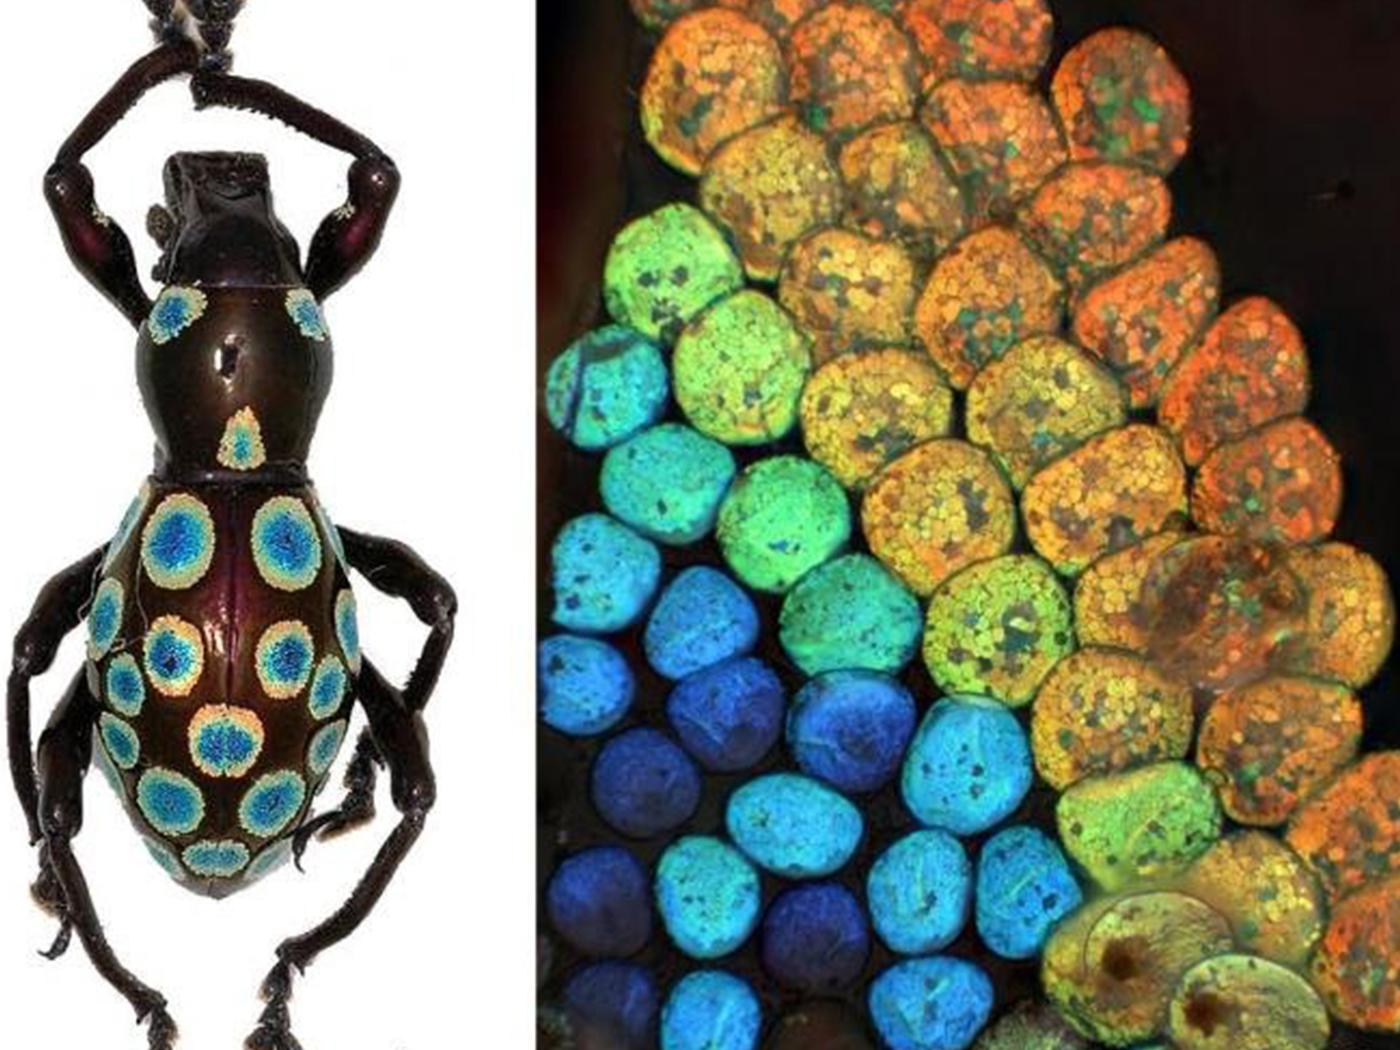 Complex Engineering in Weevils Befuddles Evolution